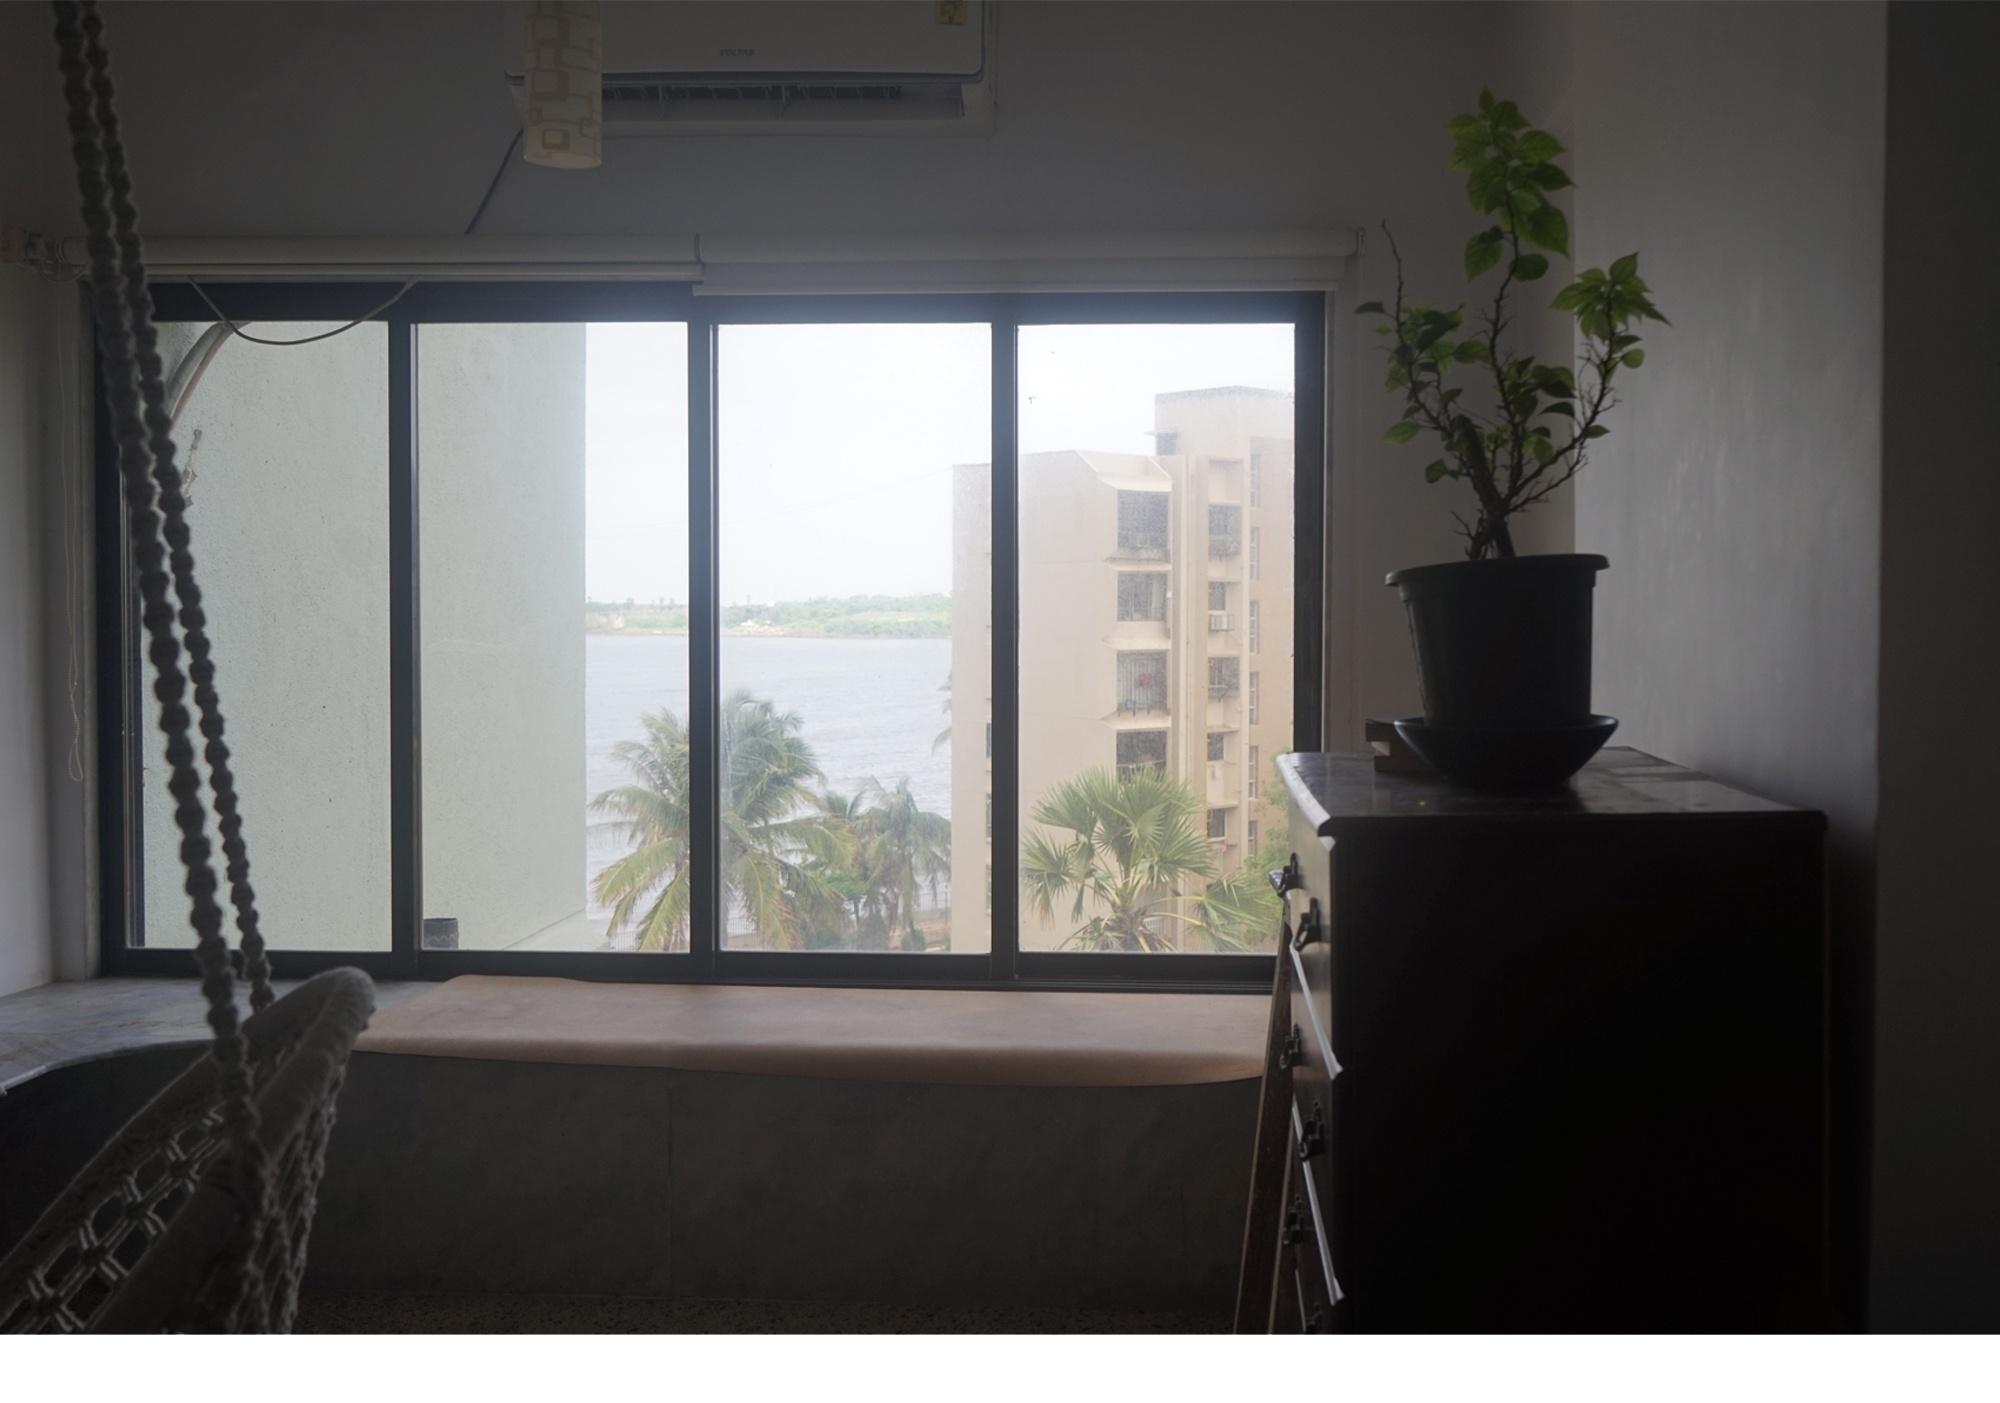 I_Brought_Home_A_New_Plant_Kush_1_Resized